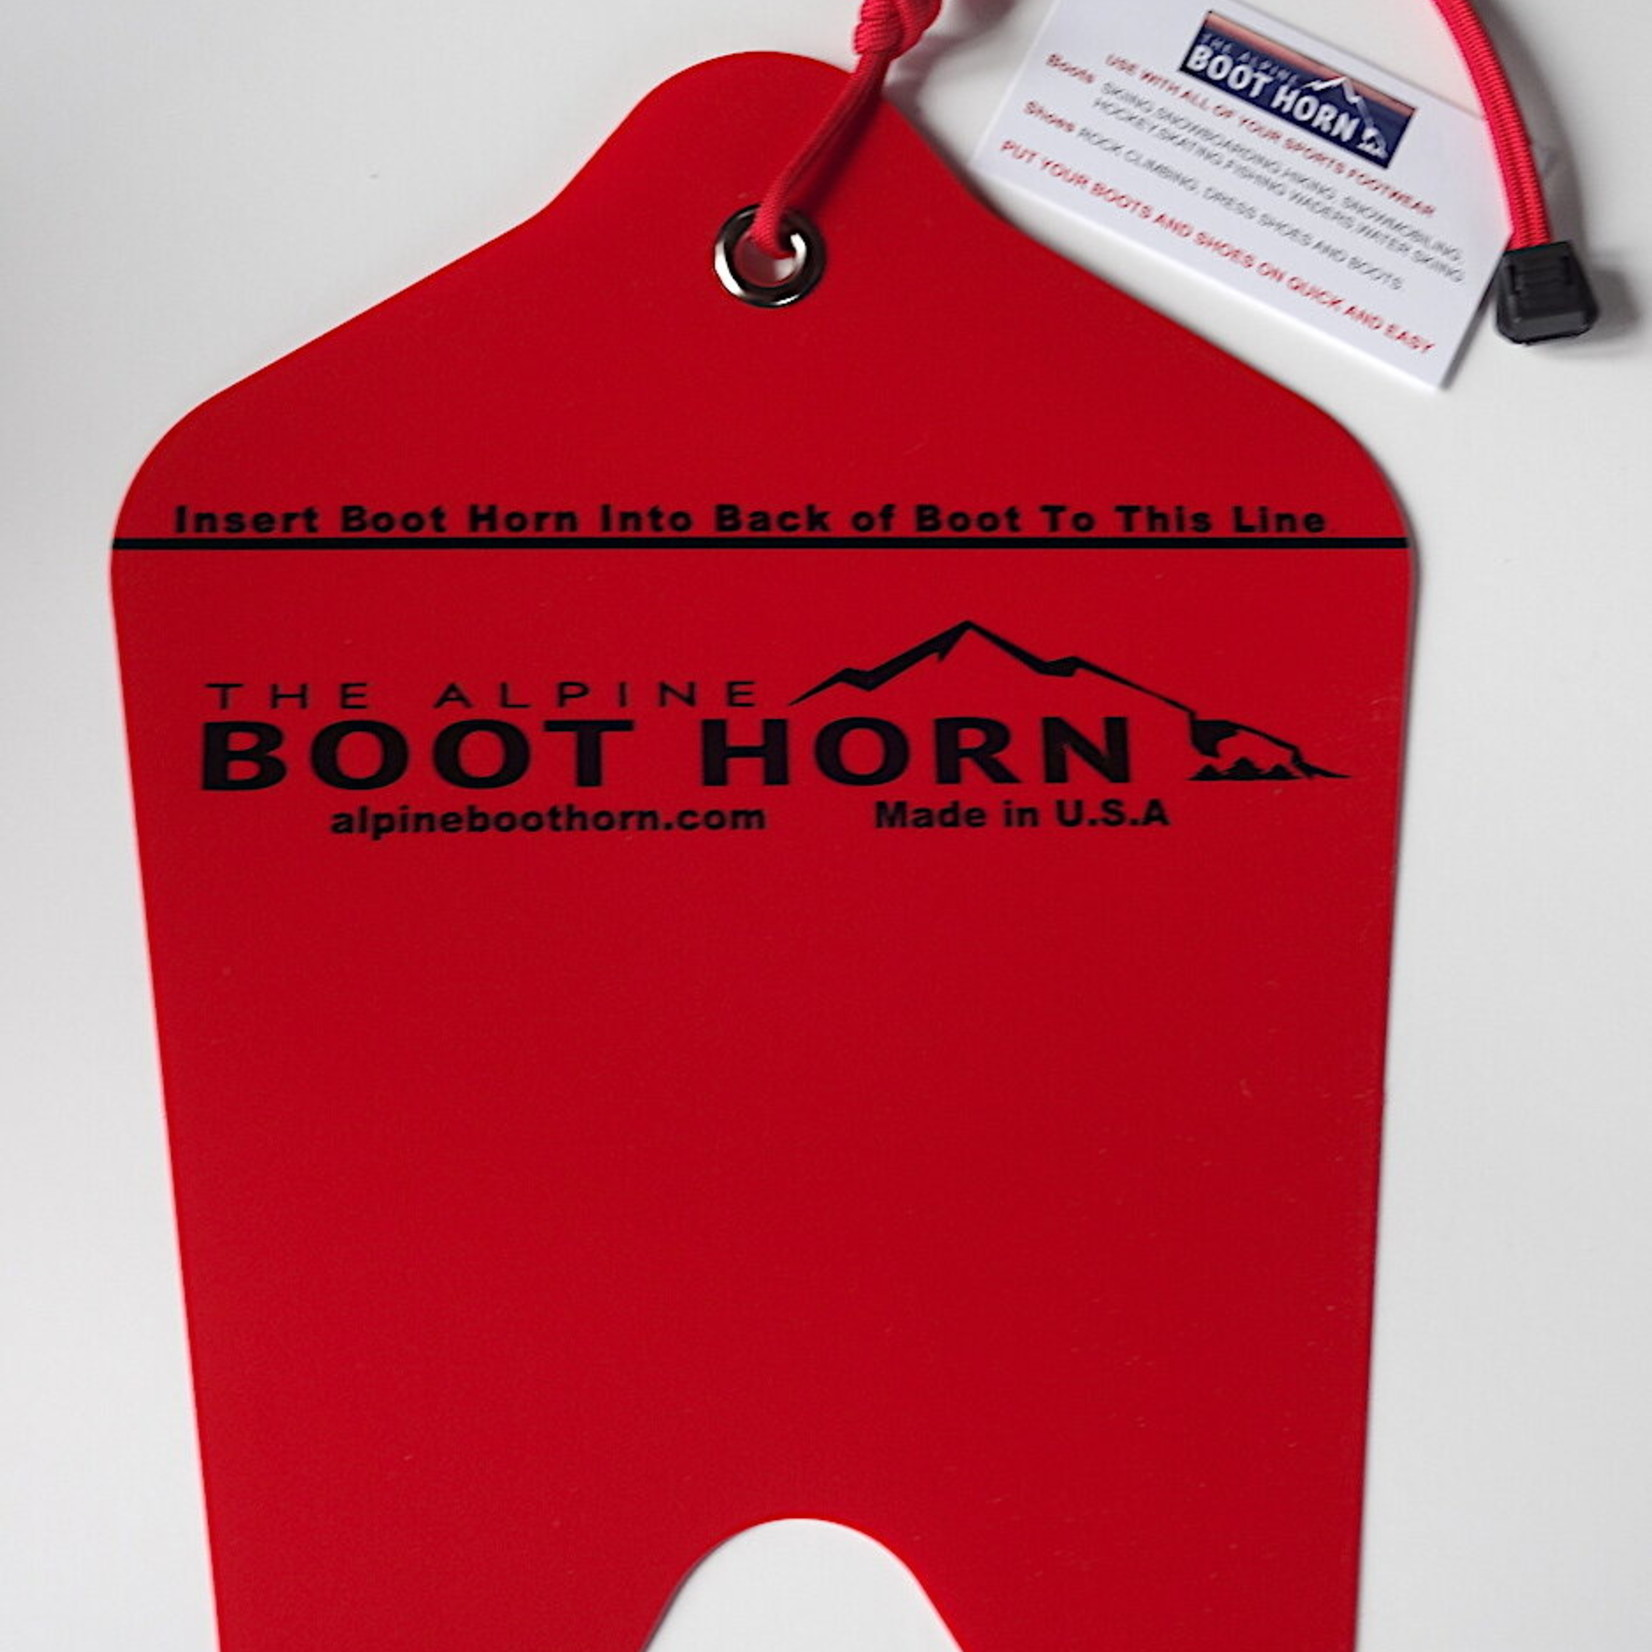 IBH Boot Horn